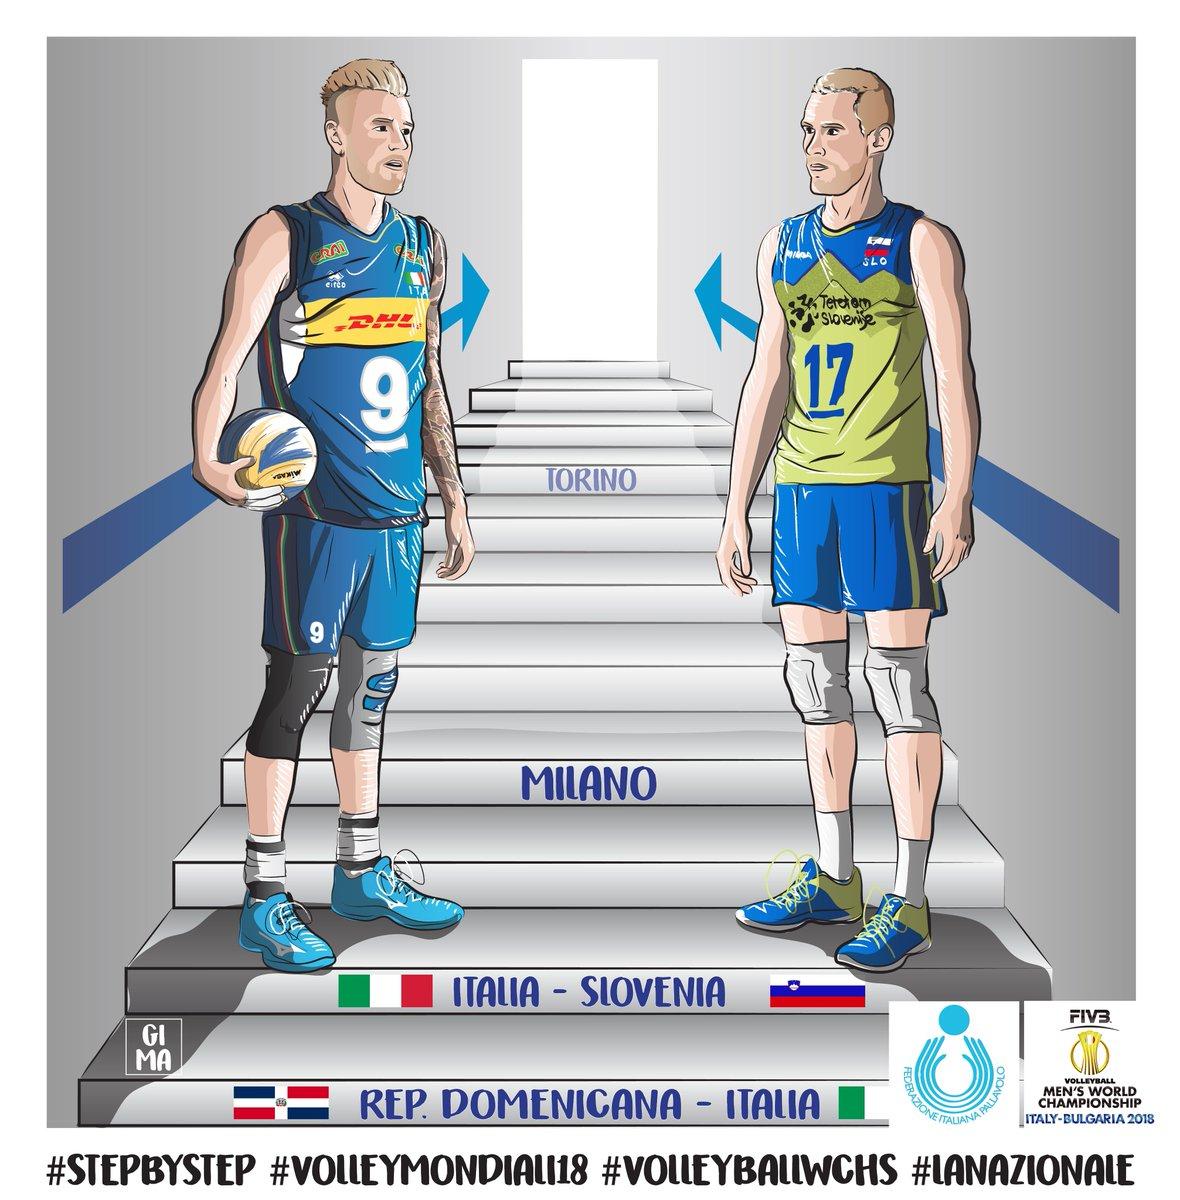 #VolleyballWchs #Firenze Step by step, stasera tocca a #ItaliaSlovenia  Ancora insieme alle 21.15 ( diretta @RaiDue ) per tifare #LaNazionale : @TimeOut_STORIES @FIVBVolleyball @SloVolley #VolleyMondiali18  - Ukustom